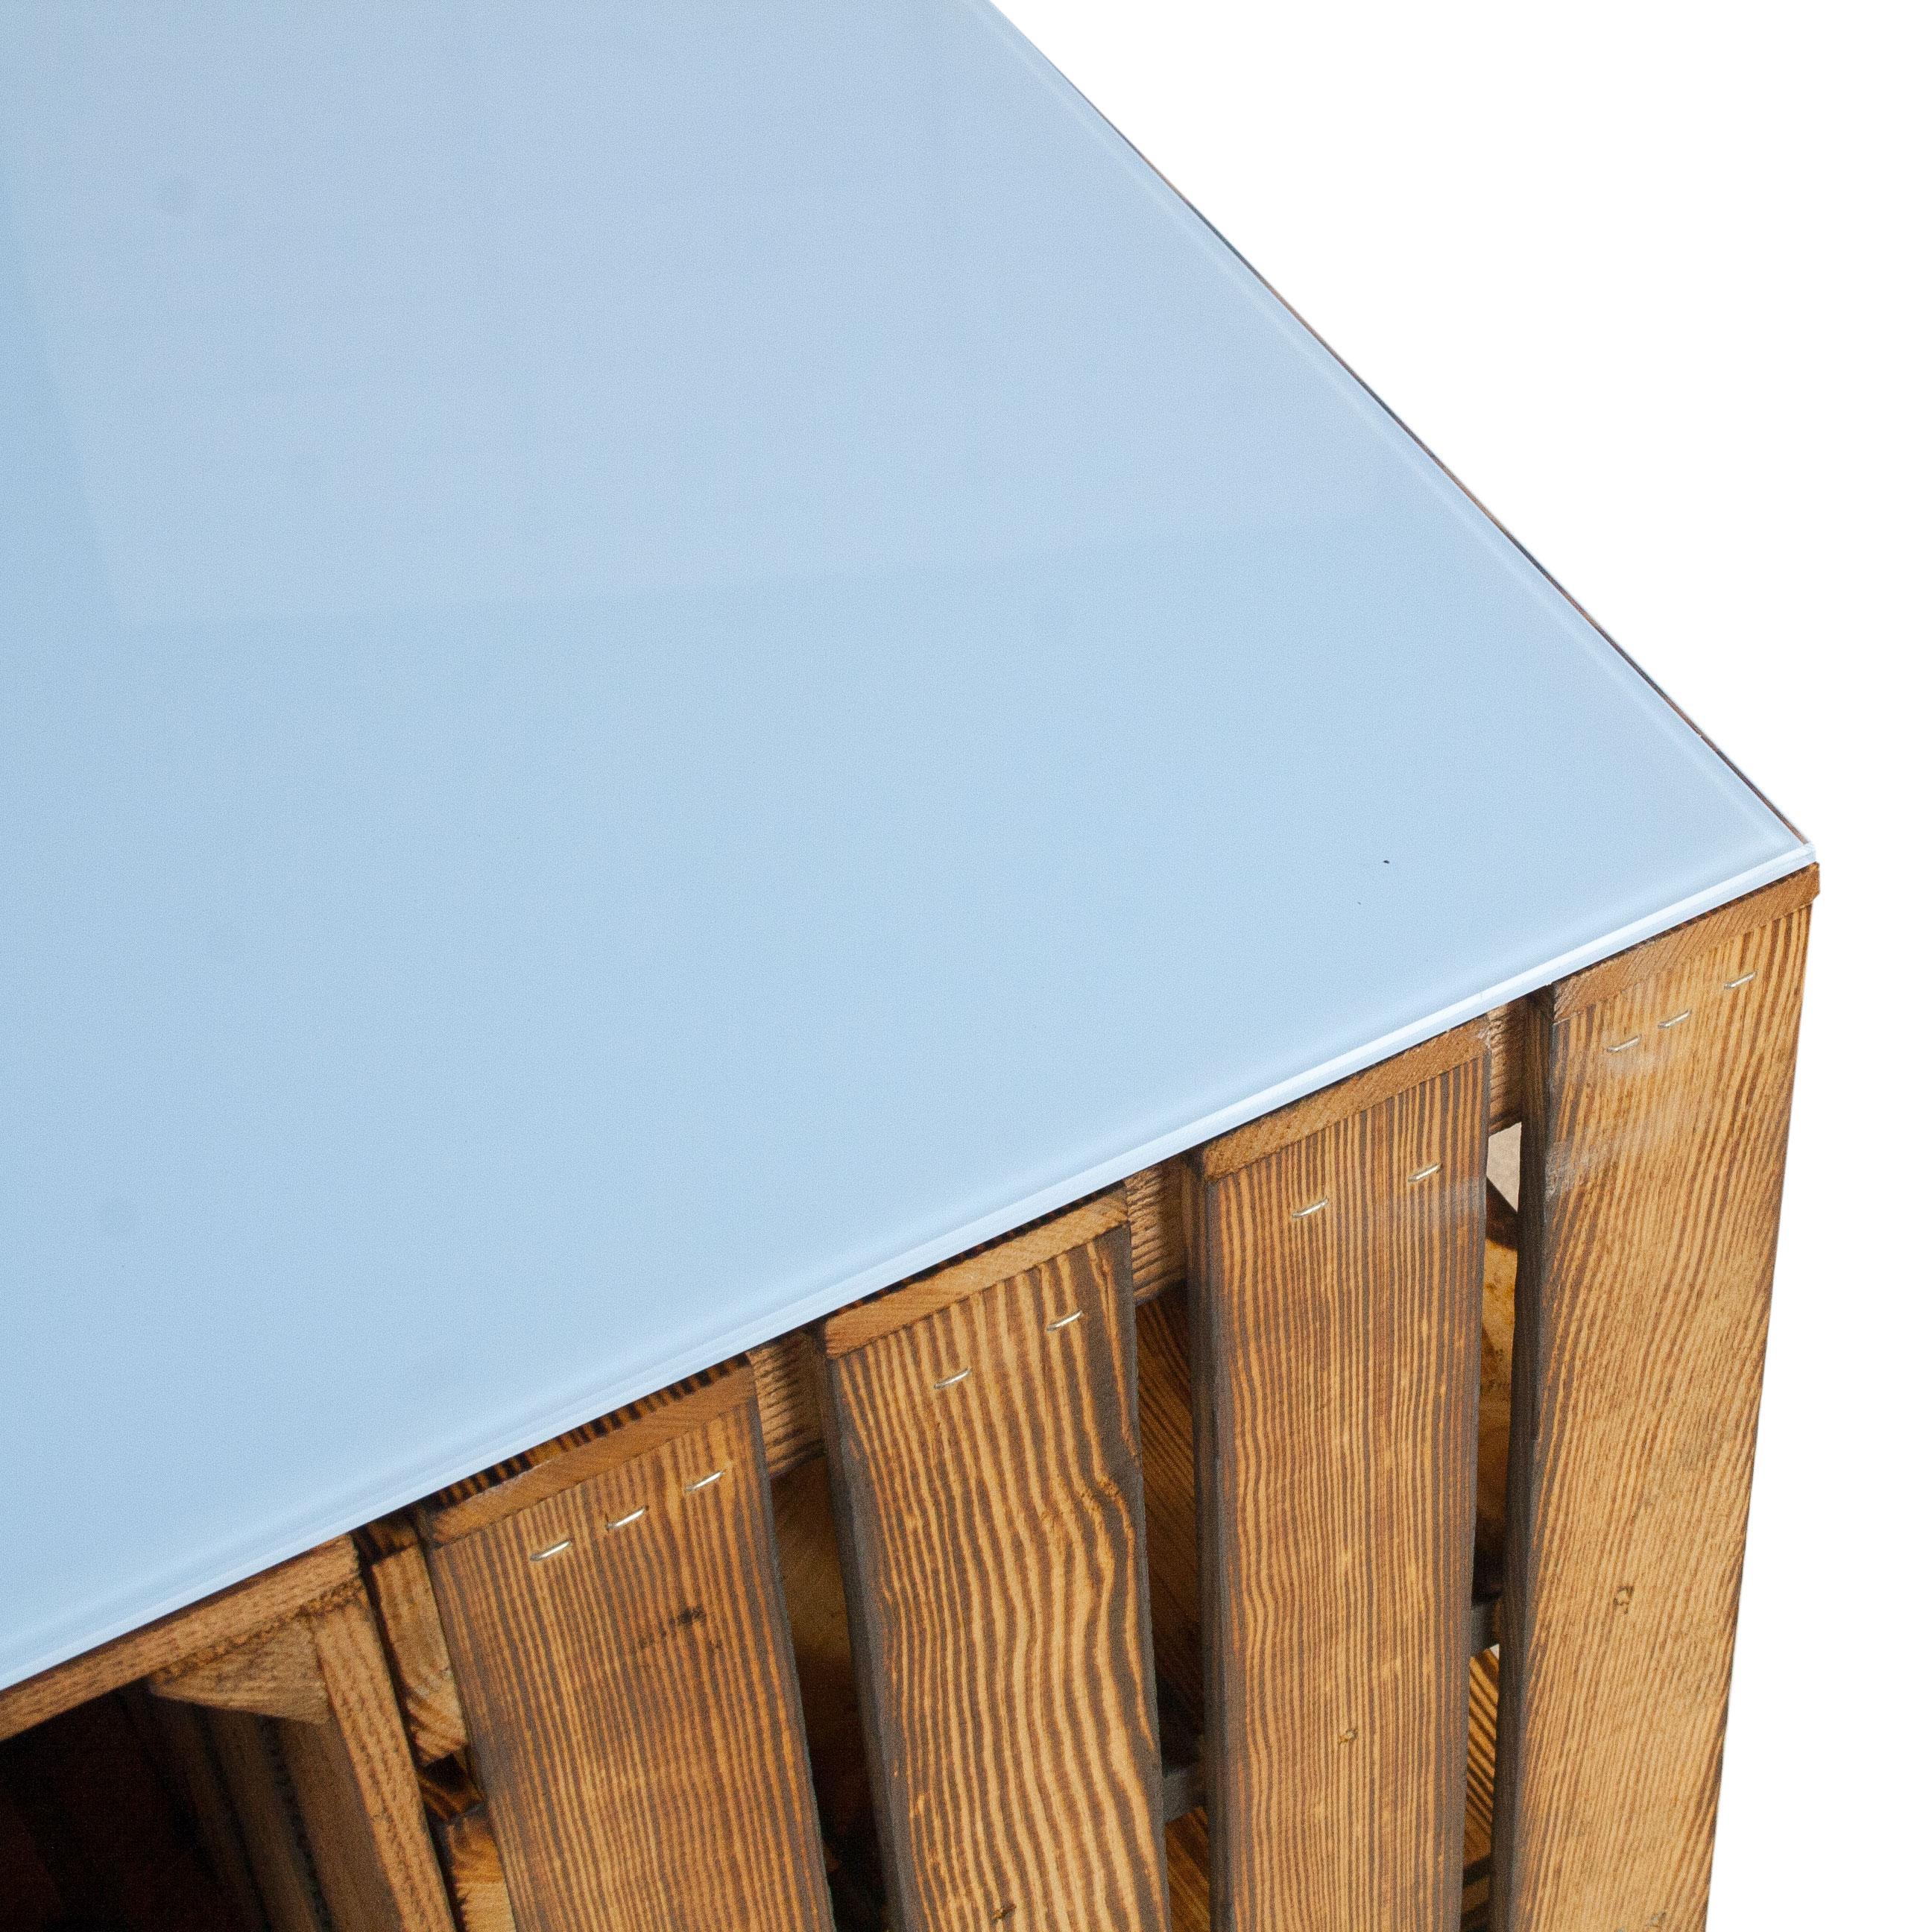 m bel geflammter couchtisch aus apfelkisten mit rollen inkl hellblauer glasplatte 81x81x44cm. Black Bedroom Furniture Sets. Home Design Ideas